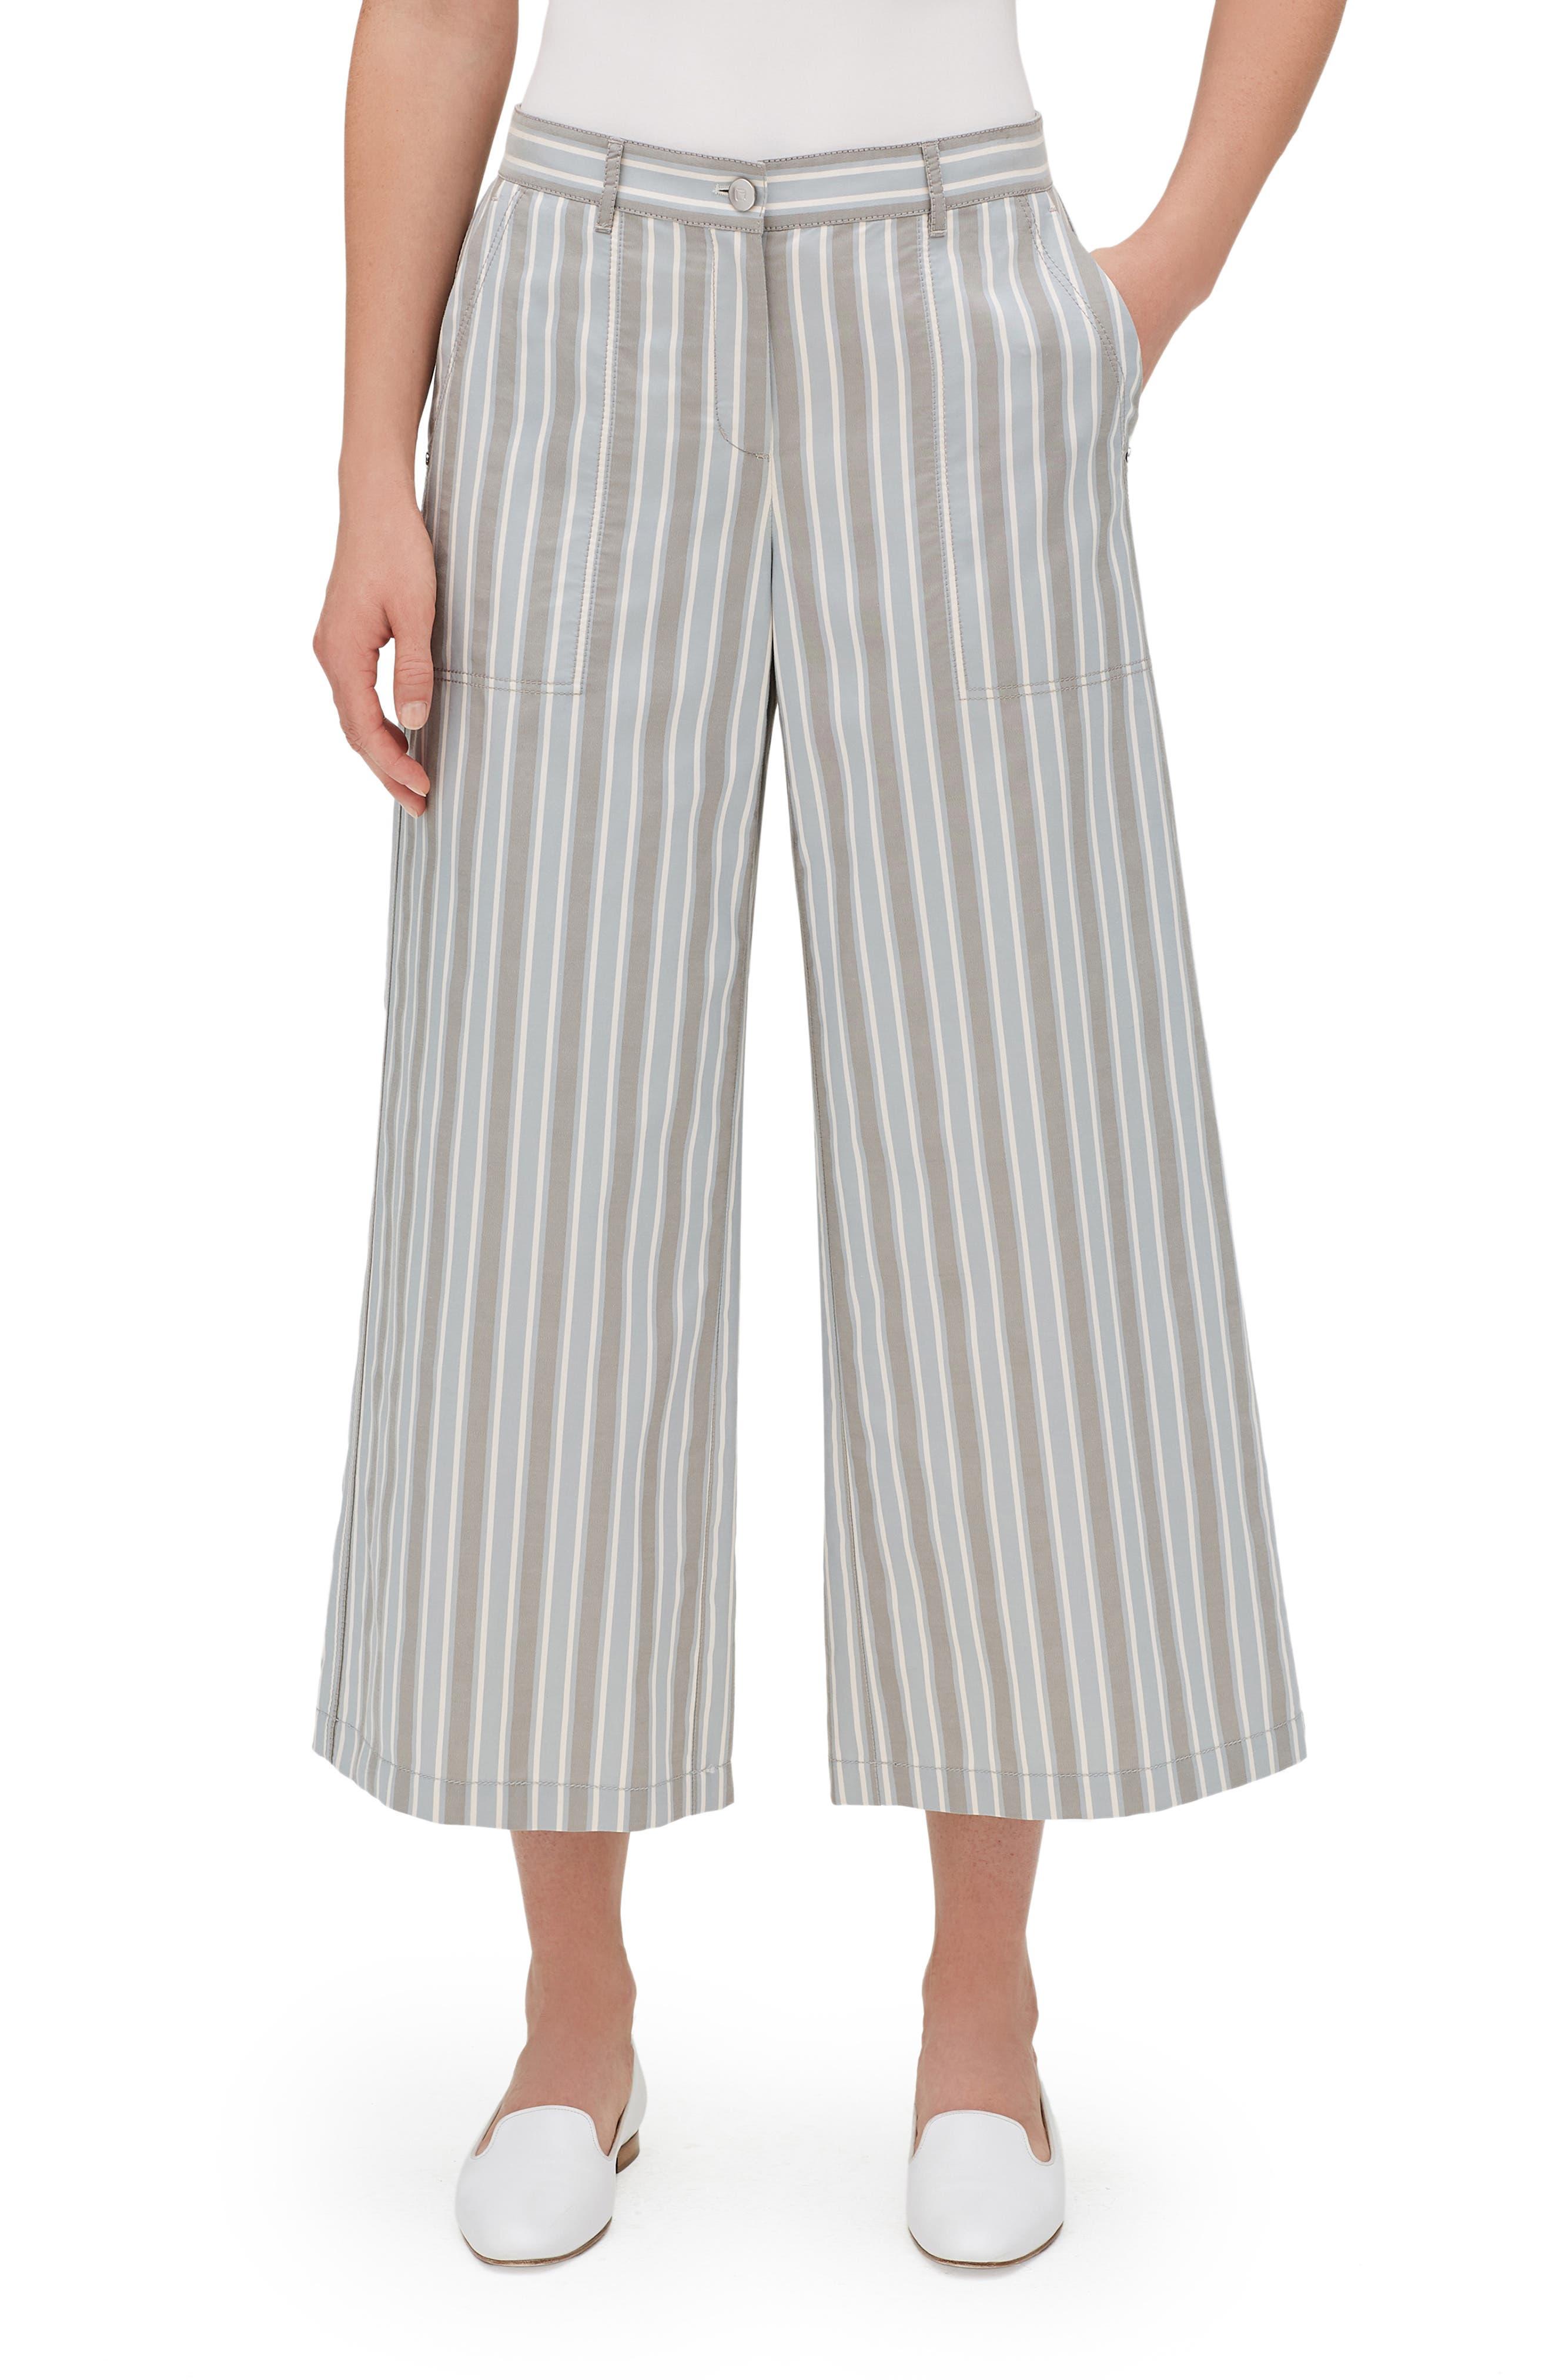 Fulton Elixir Stripe Crop Wide Leg Pants,                             Main thumbnail 1, color,                             MERCURY MULTI